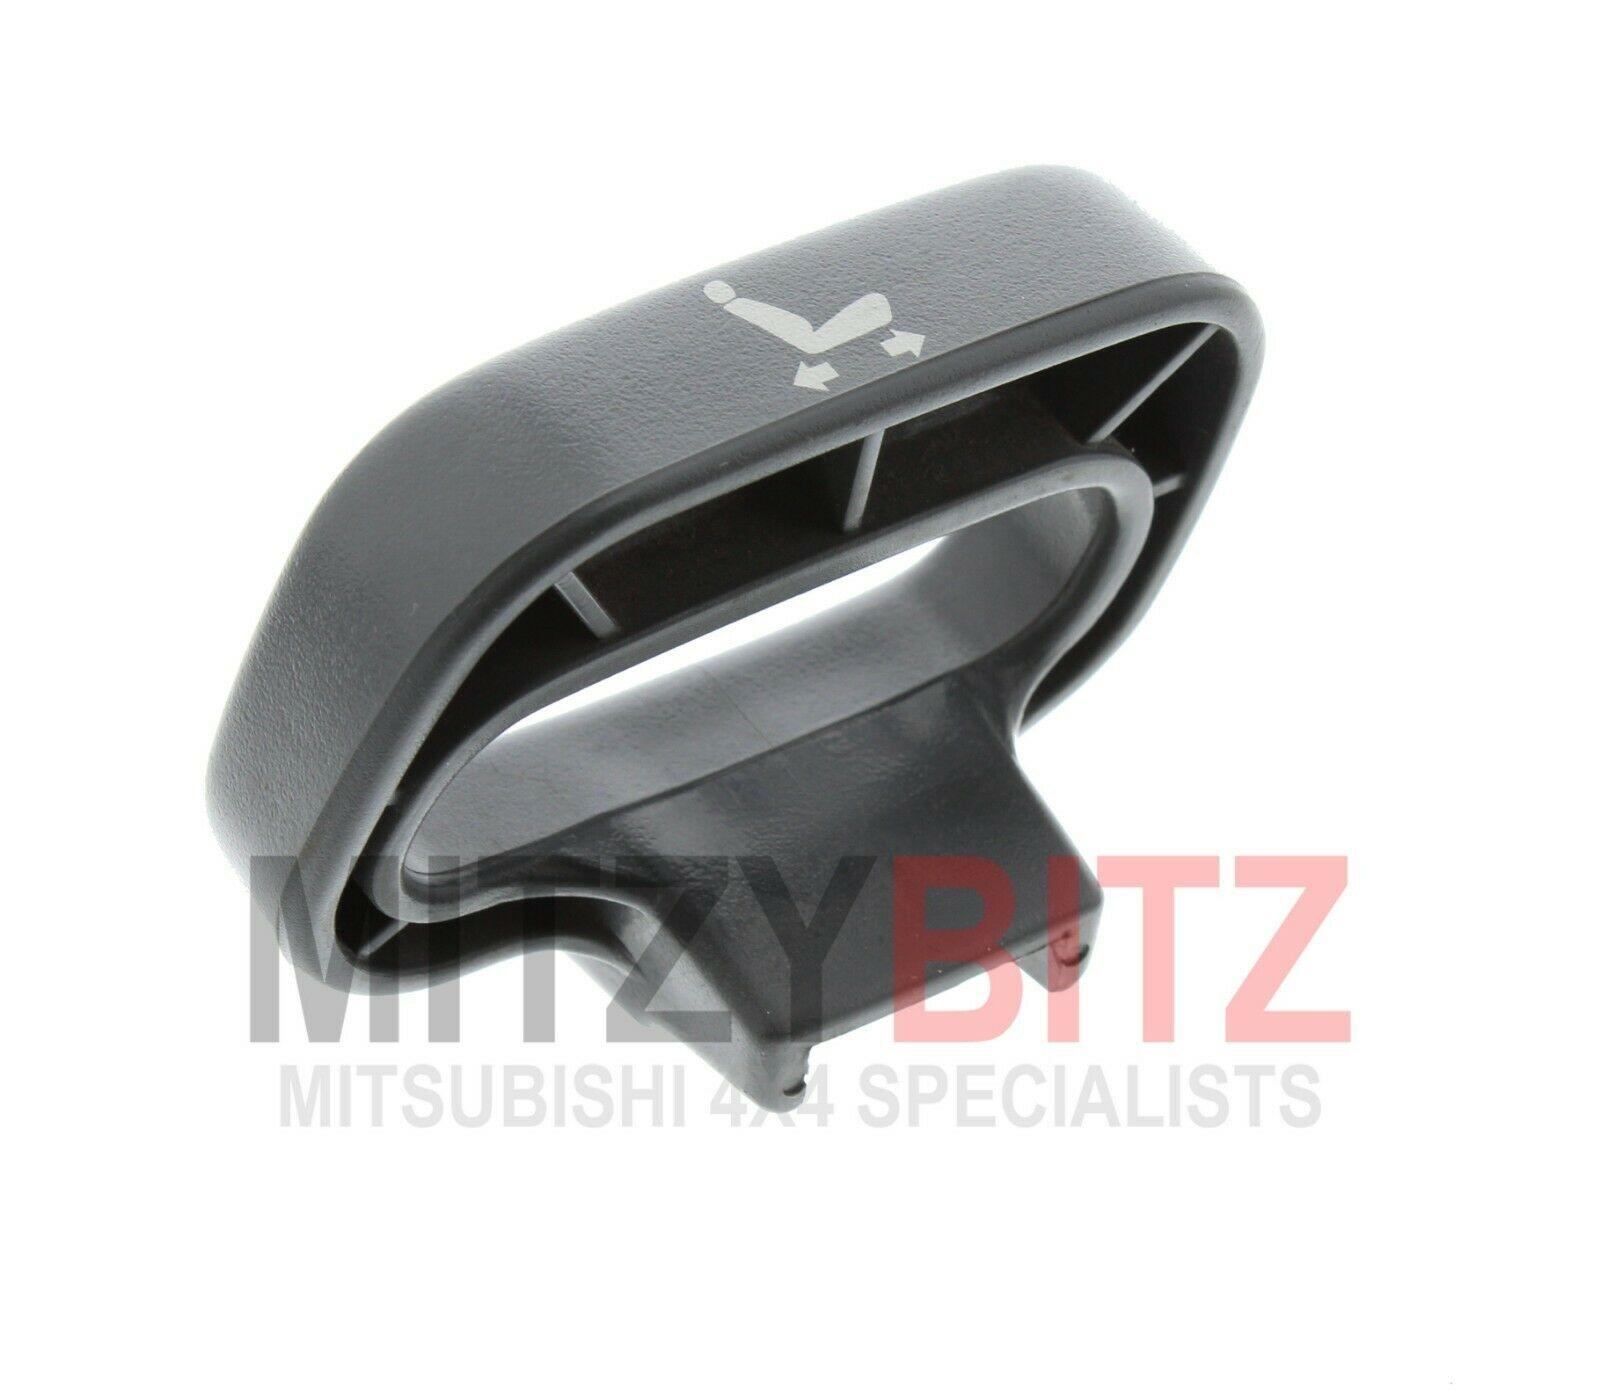 Mitsubishi Shogun Mk2 Rear Interior Grey Leather Roof Grab Handle Non Sided